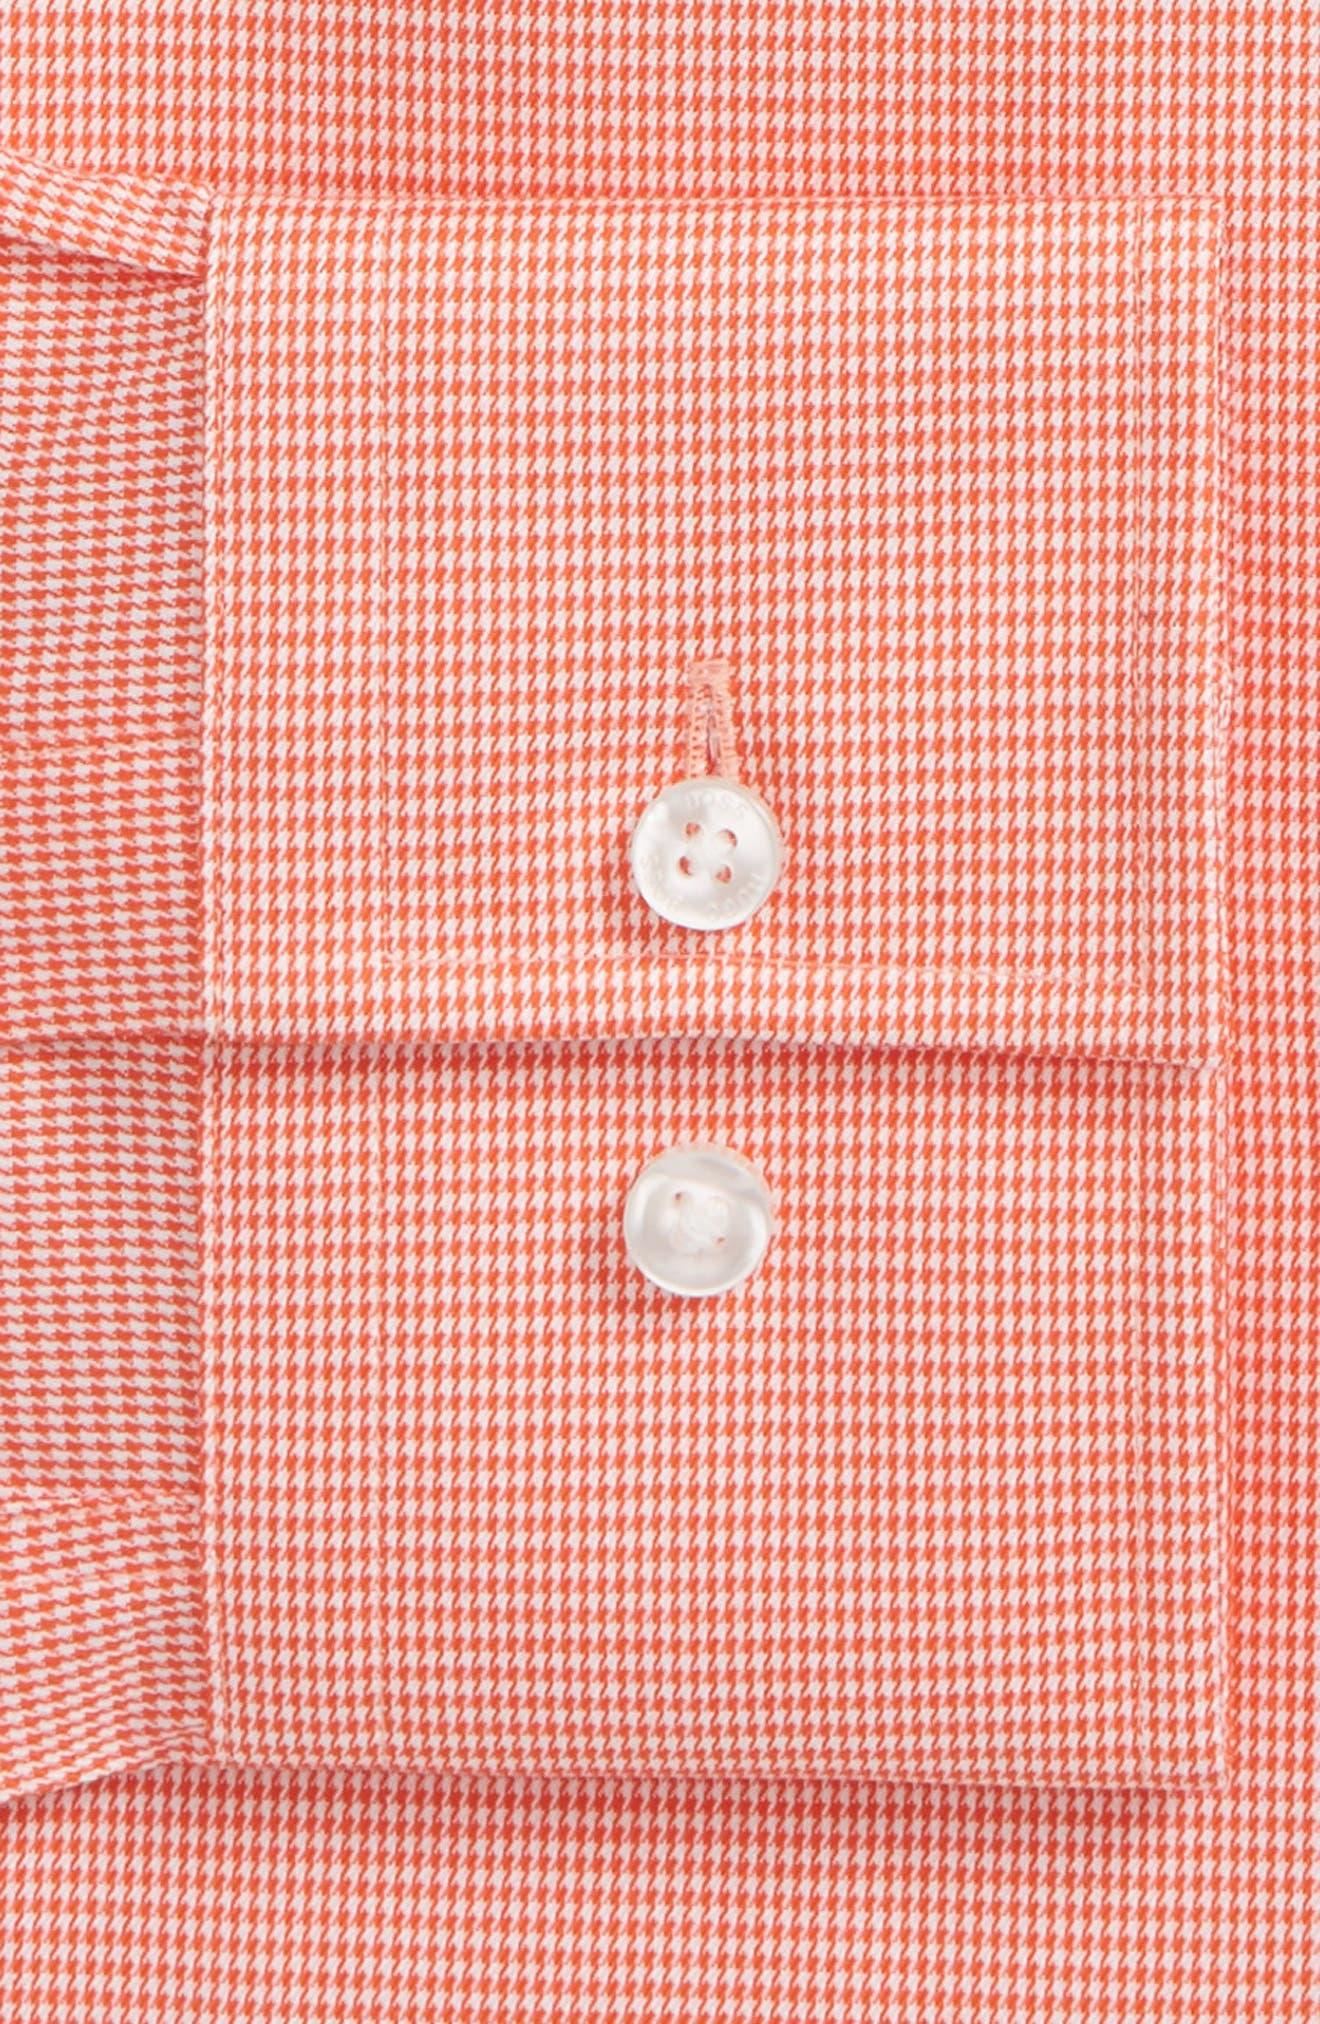 Jason Slim Fit Houndstooth Dress Shirt,                             Alternate thumbnail 2, color,                             Orange